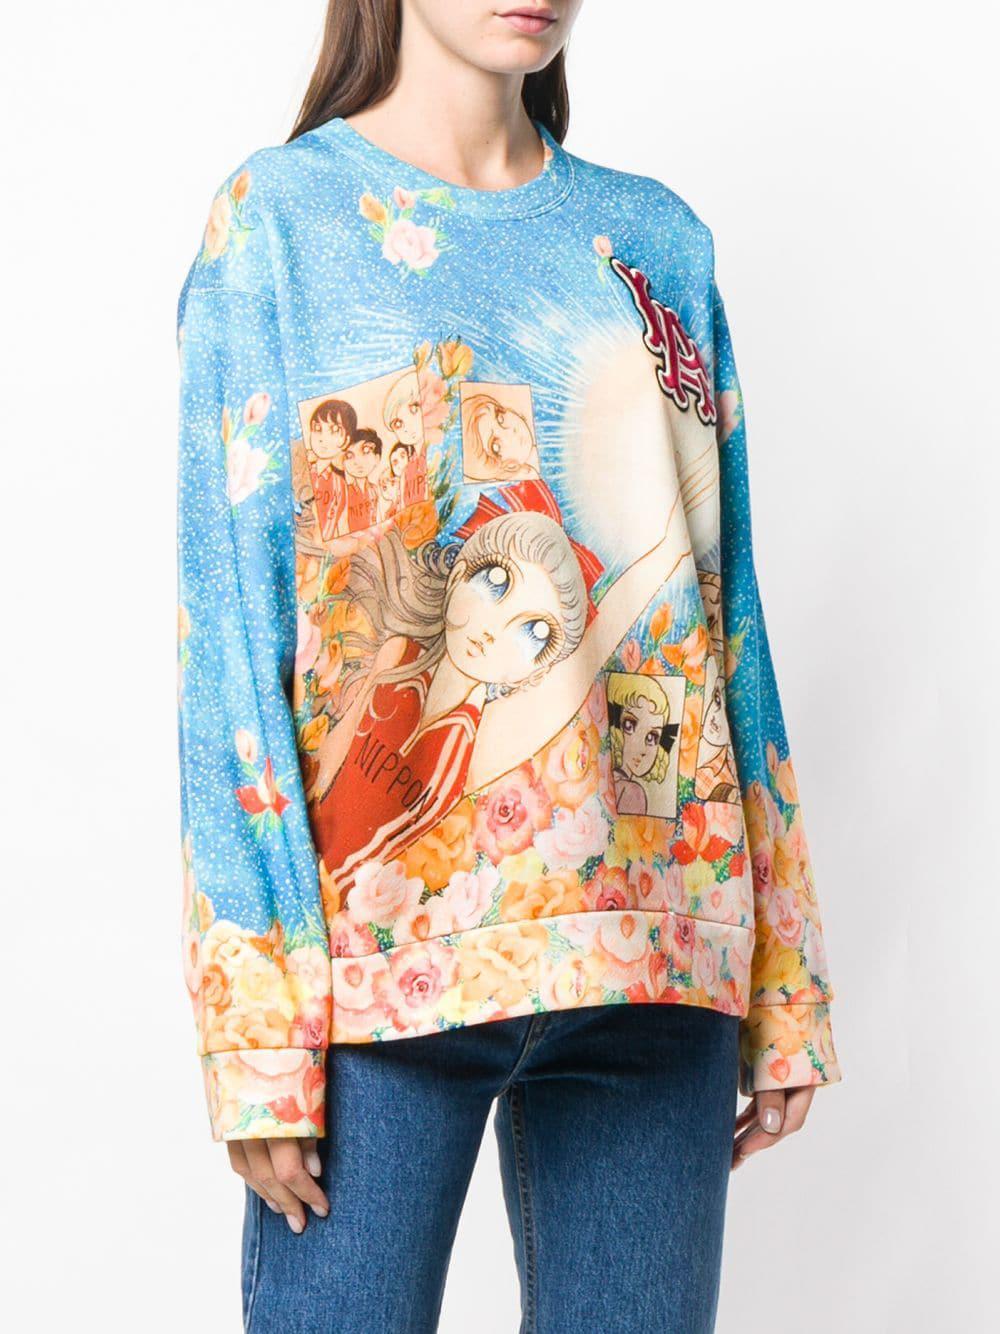 e9b0762f Gucci Sailor Moon Printed Sweatshirt in Blue - Lyst